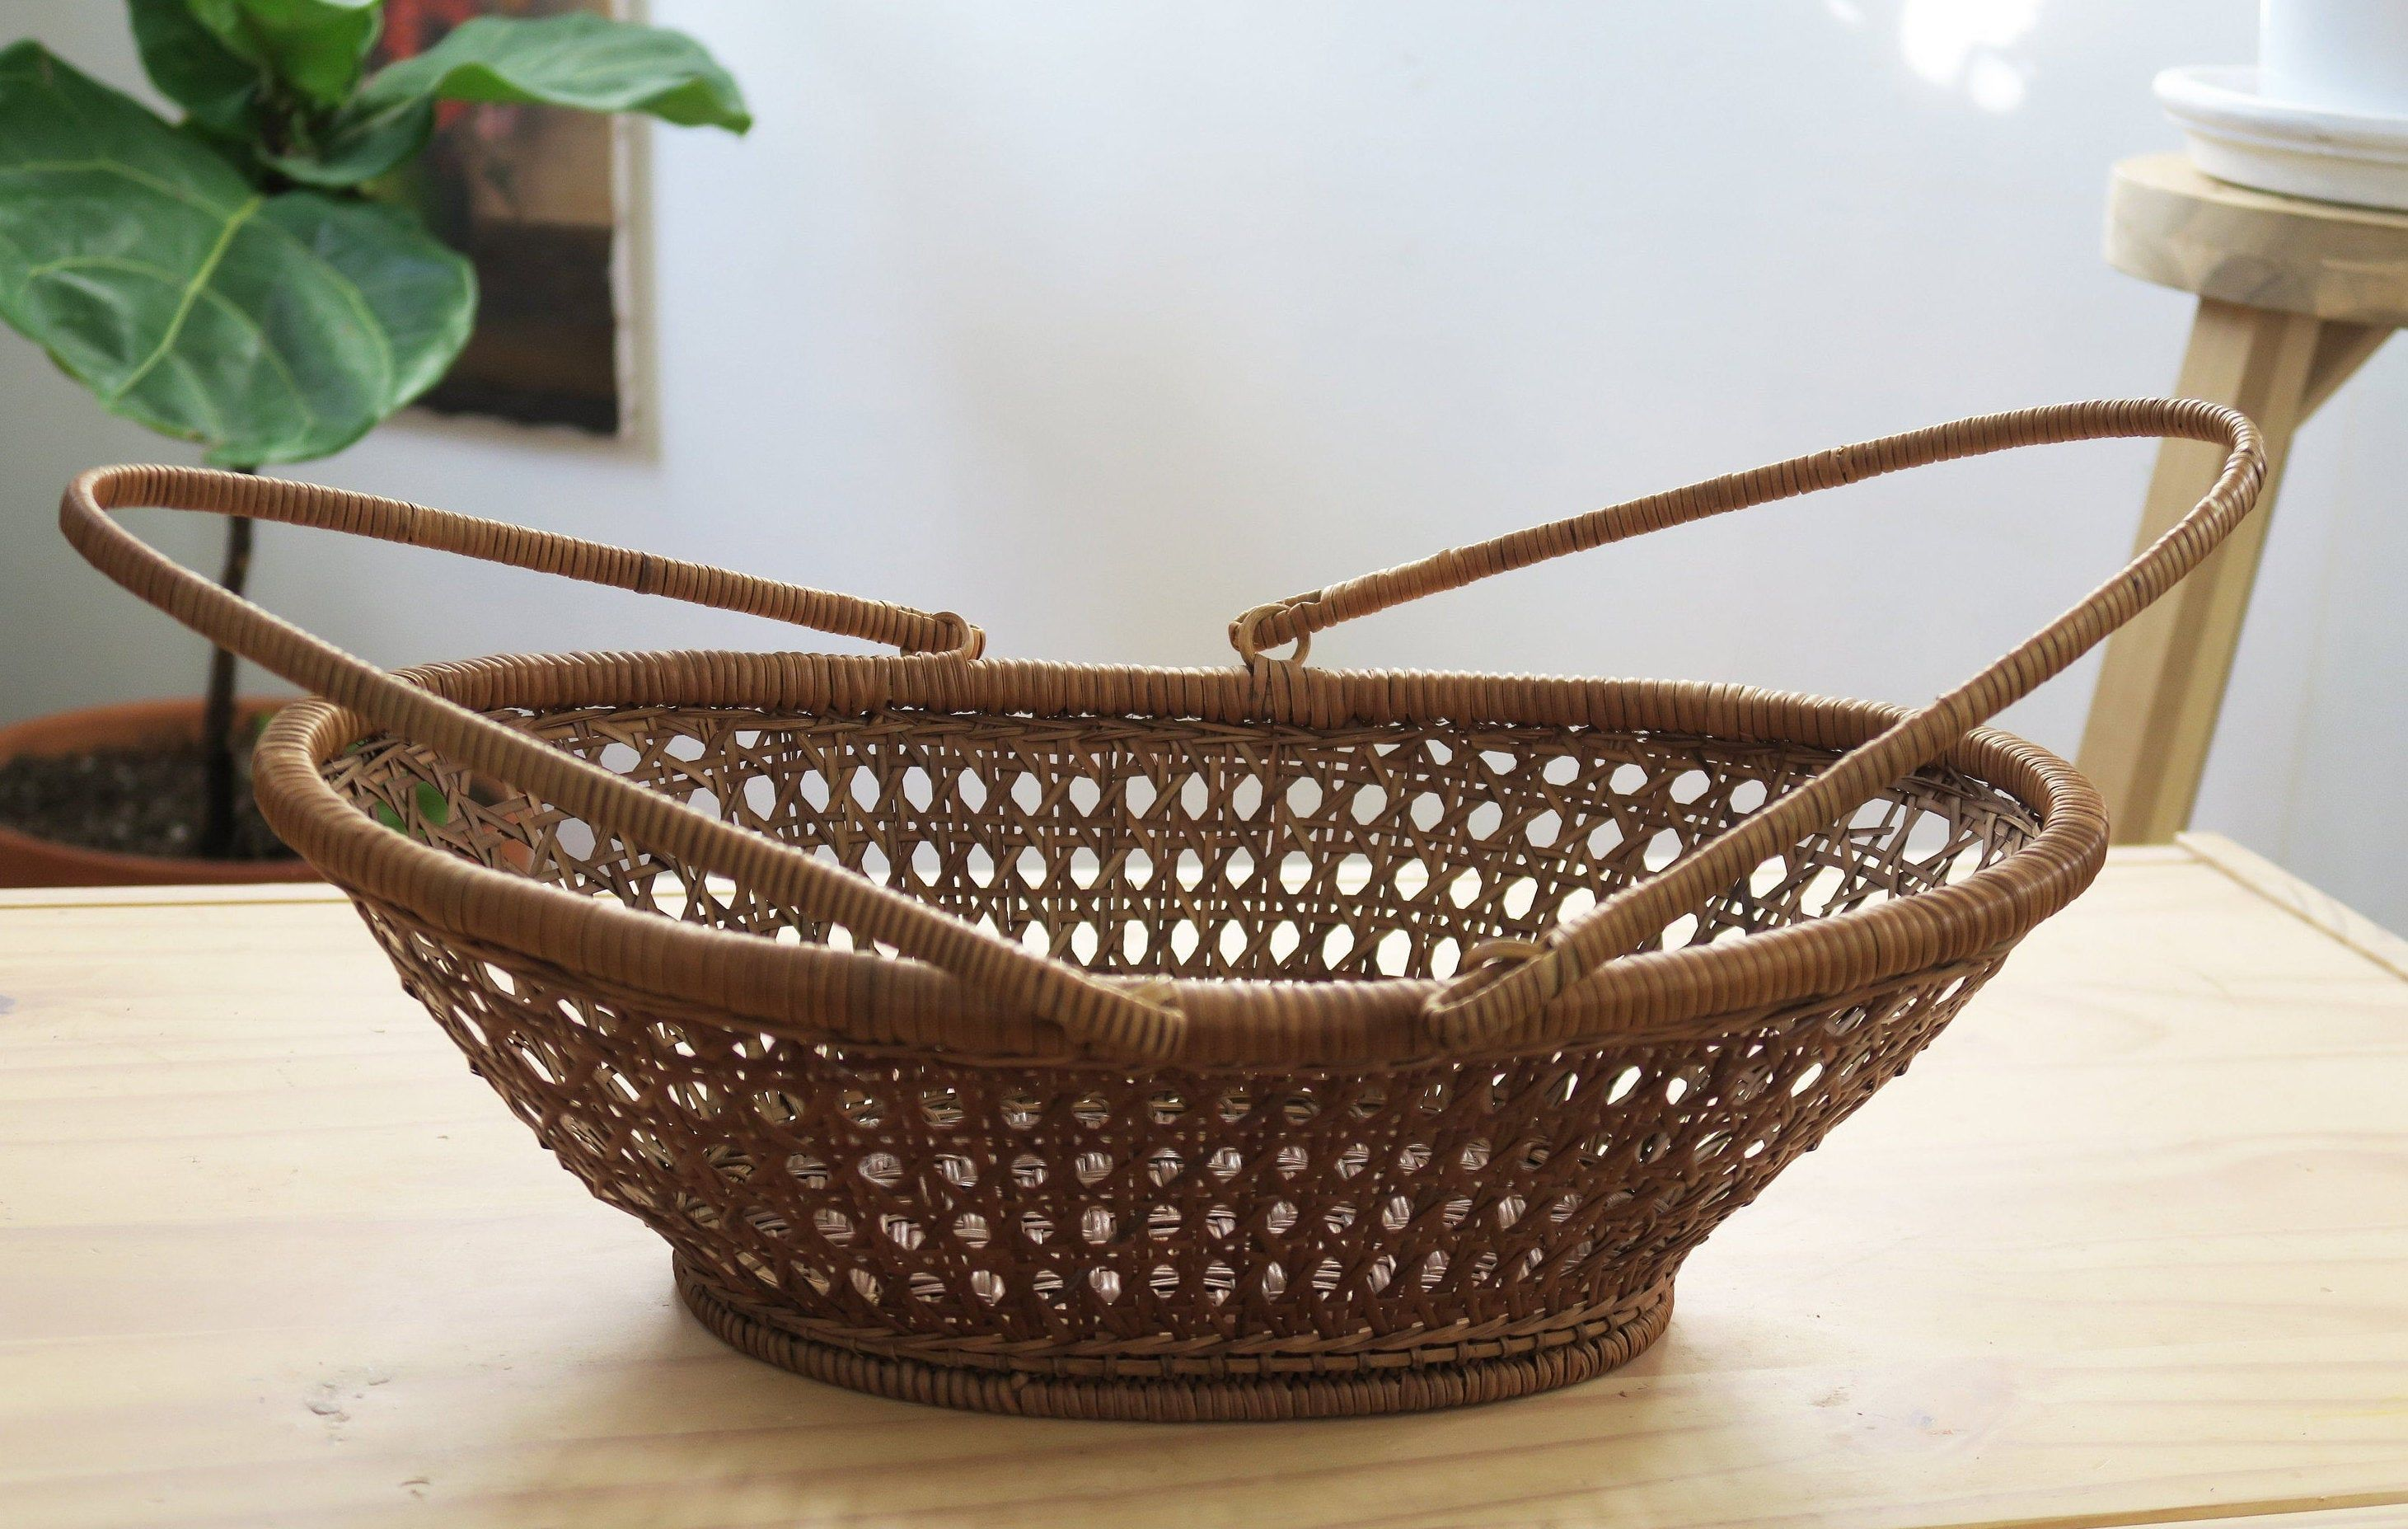 Fruit Basket Storage Basket Farmhouse Decor Rustic Decor Rustic Basket By Tgiboho On E Rustic Baskets Rustic Farmhouse Decor Wicker Baskets With Handles